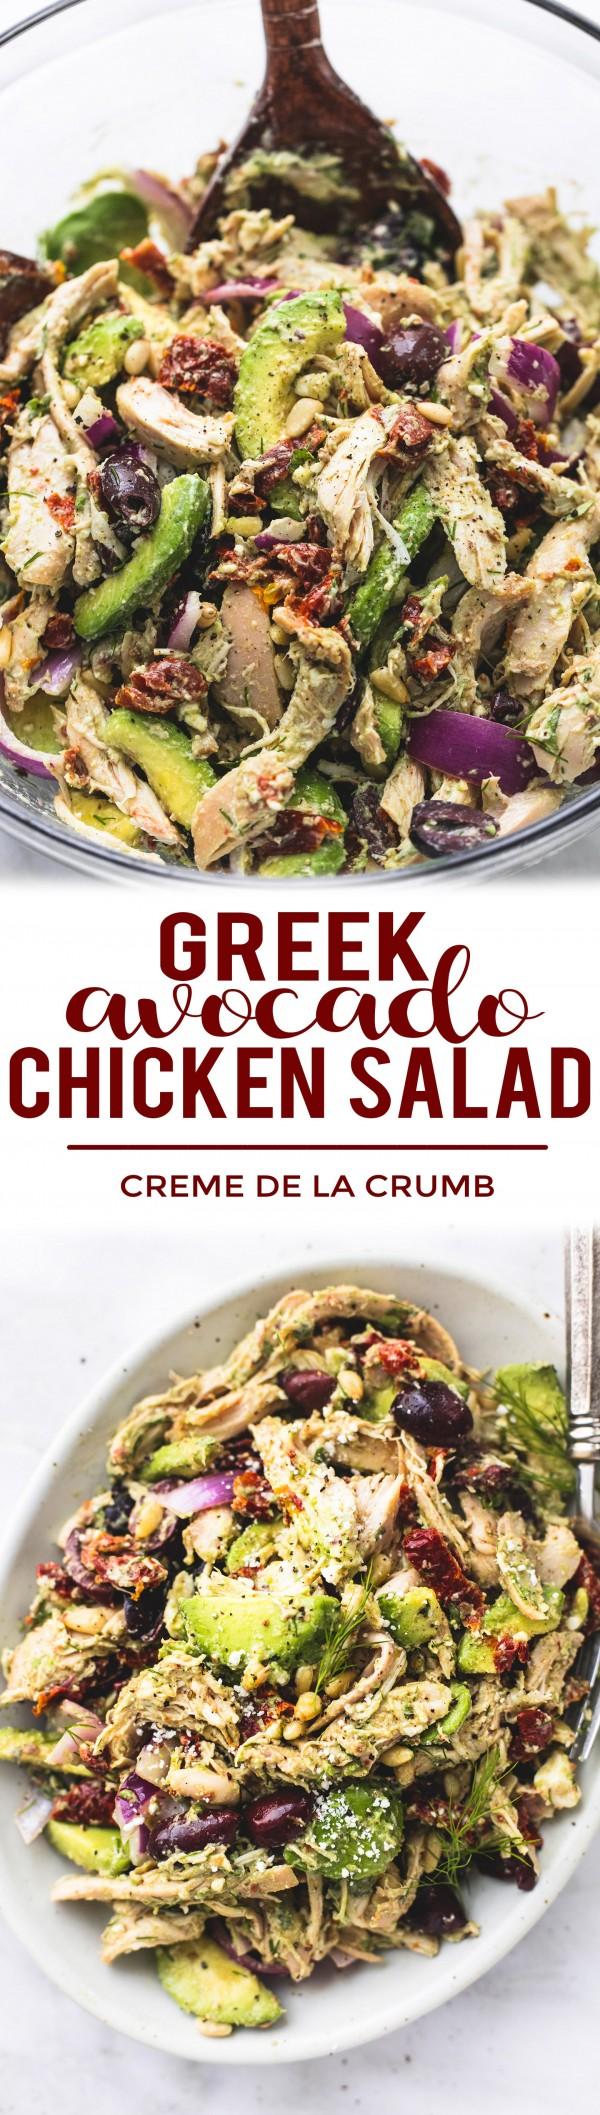 50 Best Healthy Salad Recipes Ever - Check out this recipe for Greek avocado chicken salad. Yummy! #RecipeIdeas @recipes_to_go